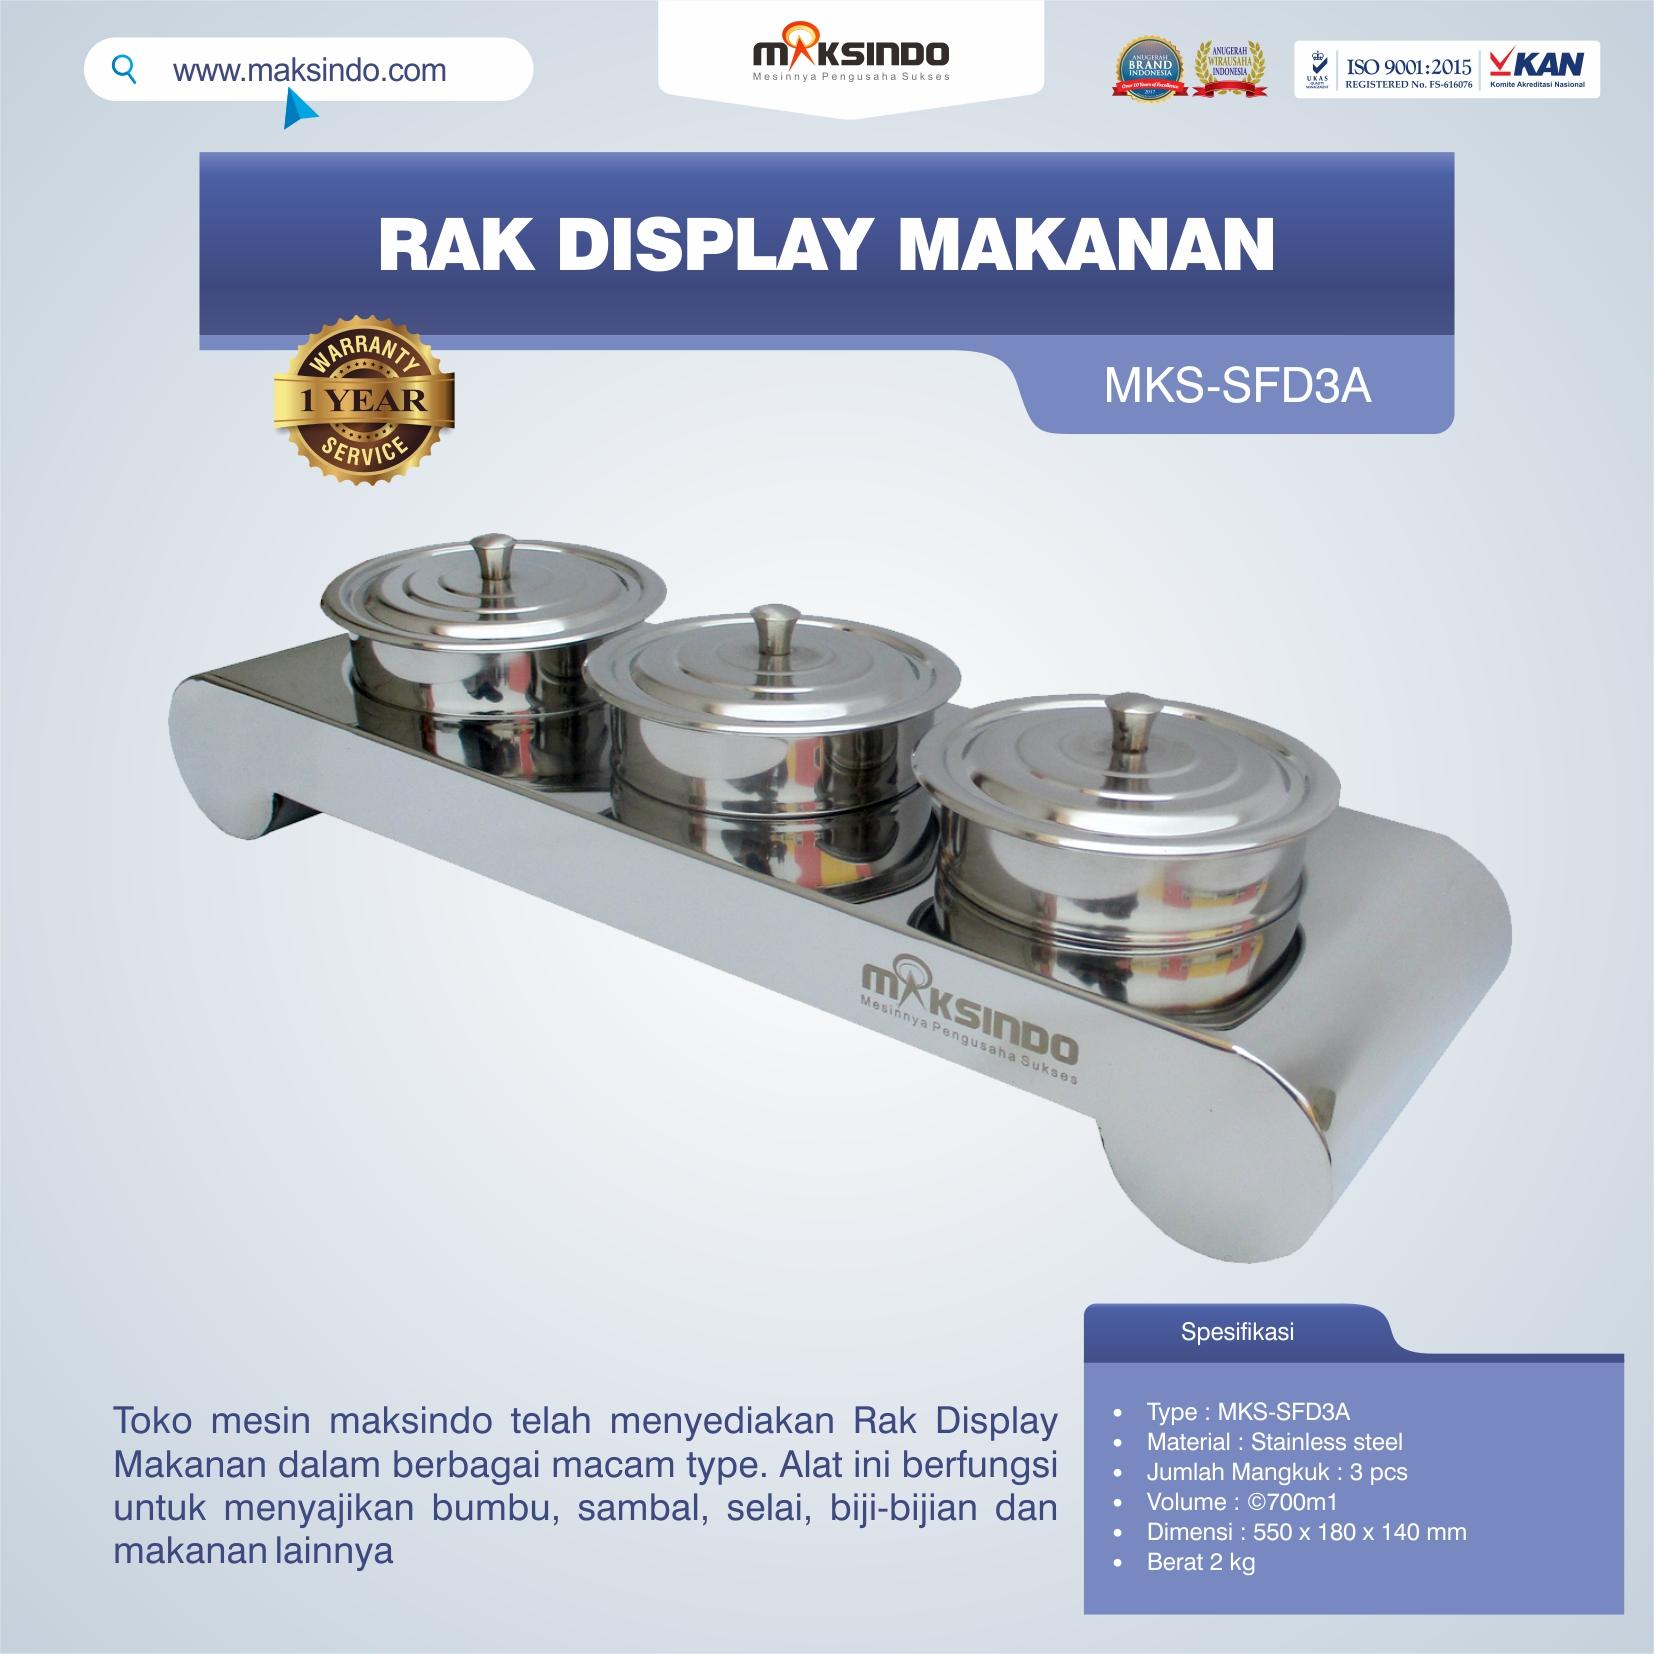 Jual Rak Display Makanan MKS-SFD3A di Jakarta